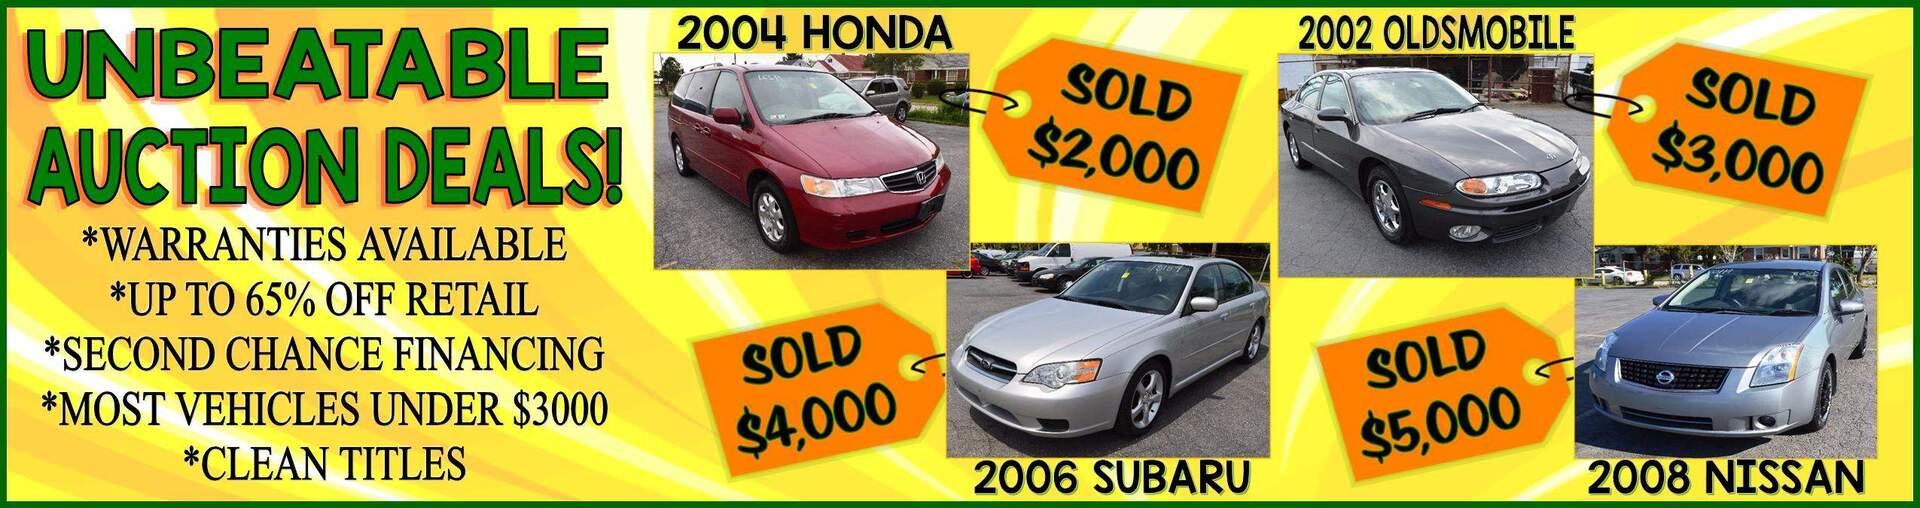 Cars For Sale On Craigslist In Bloomington Illinois | How ...